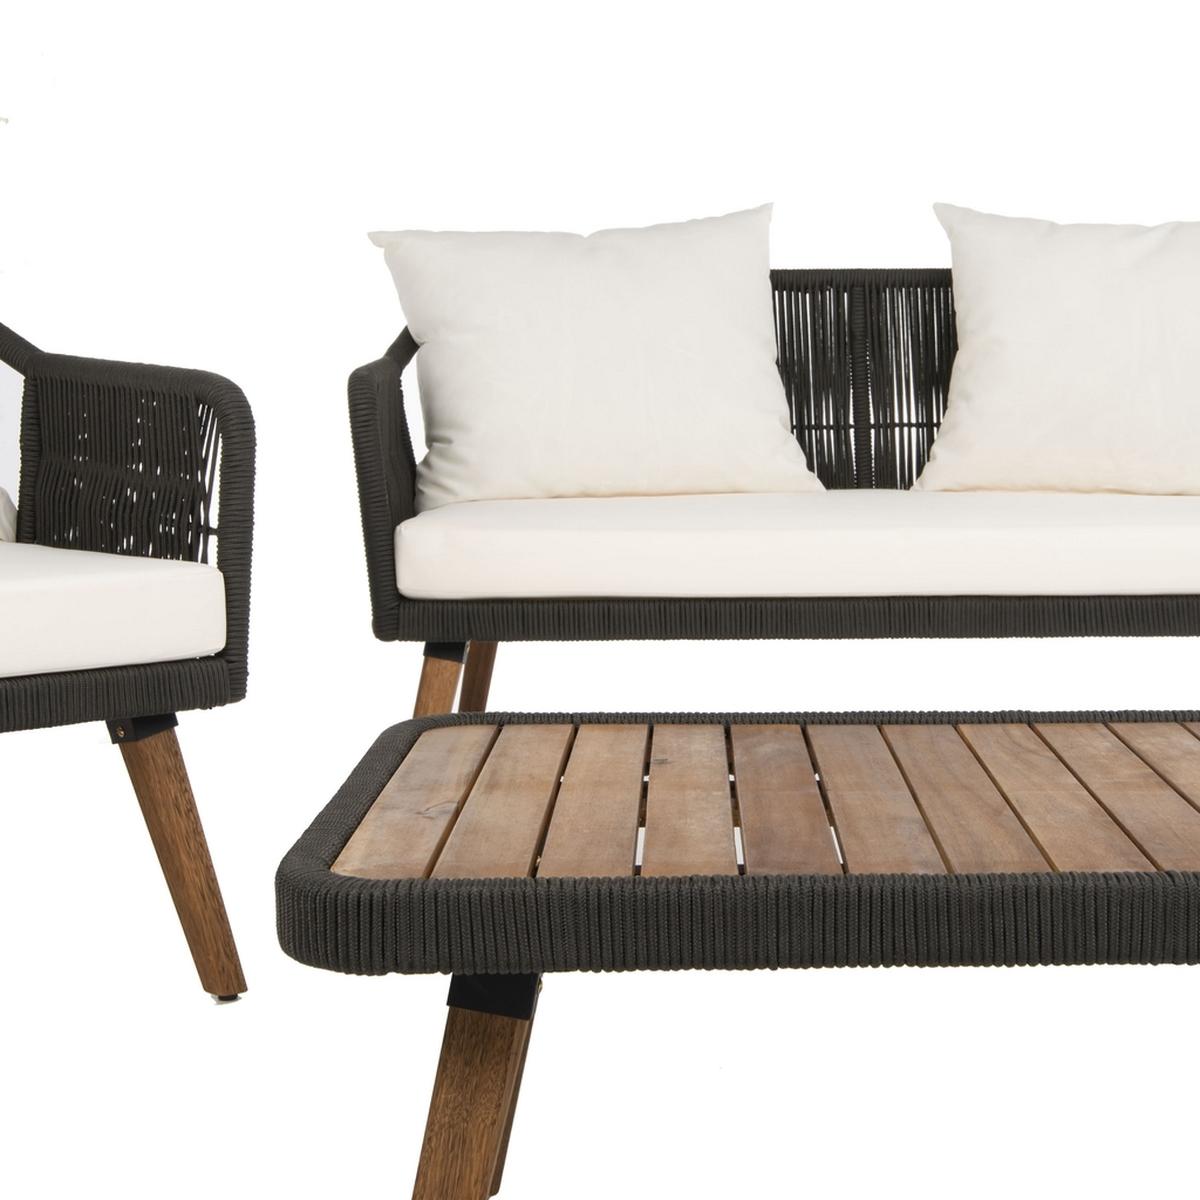 PAT7049B Patio Sets - 4 Piece - Furniture by Safavieh on Safavieh Raldin id=99324